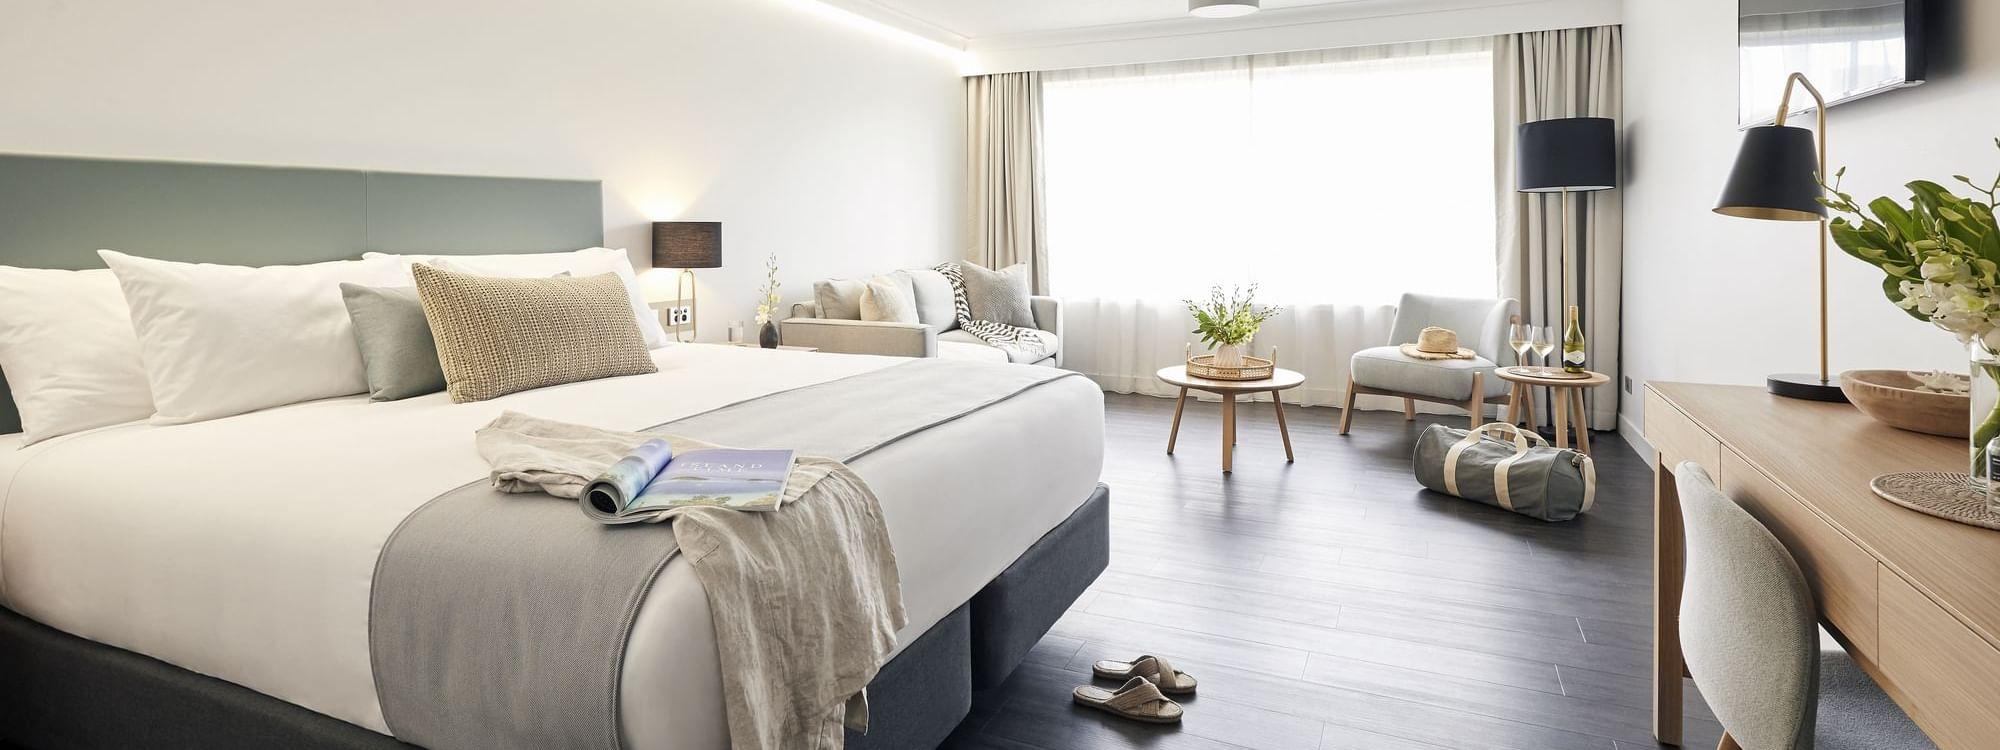 Modern comfy bed in Resort Room at Daydream Island Resort